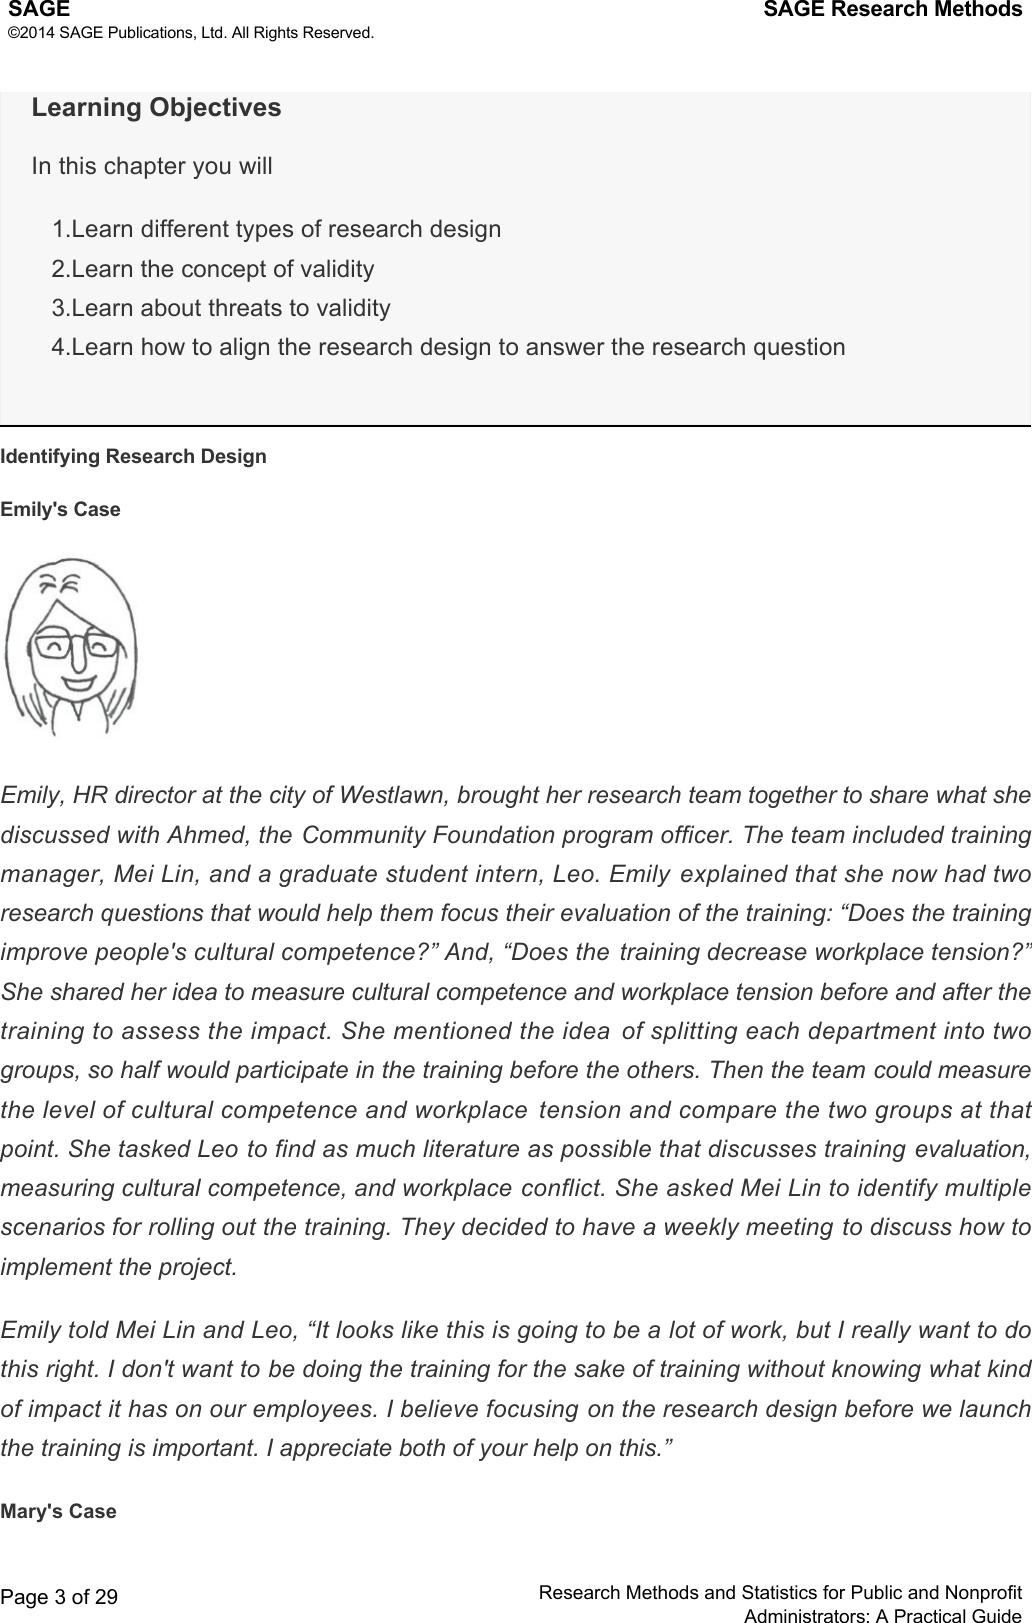 Research Methods And Statistics For Public Nonprofit Administrators